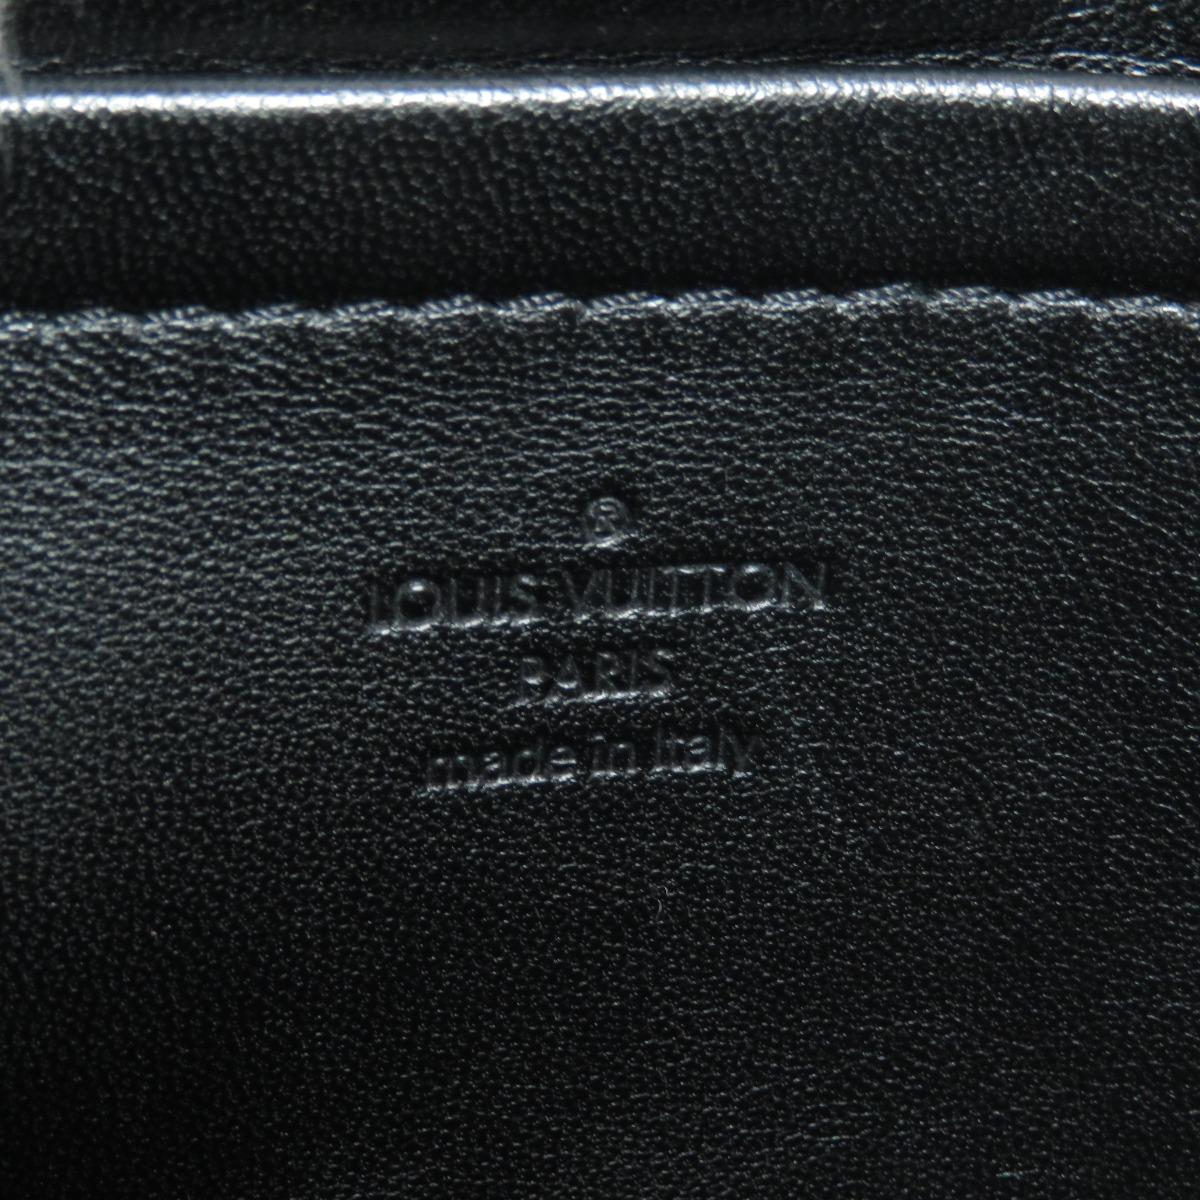 663551b84a89 ... LOUIS VUITTON/ルイヴィトン ポシェット・フラップ ショルダーバッグ【ブランド品買取】. △クリックで画像切り替え.  Loading zoom